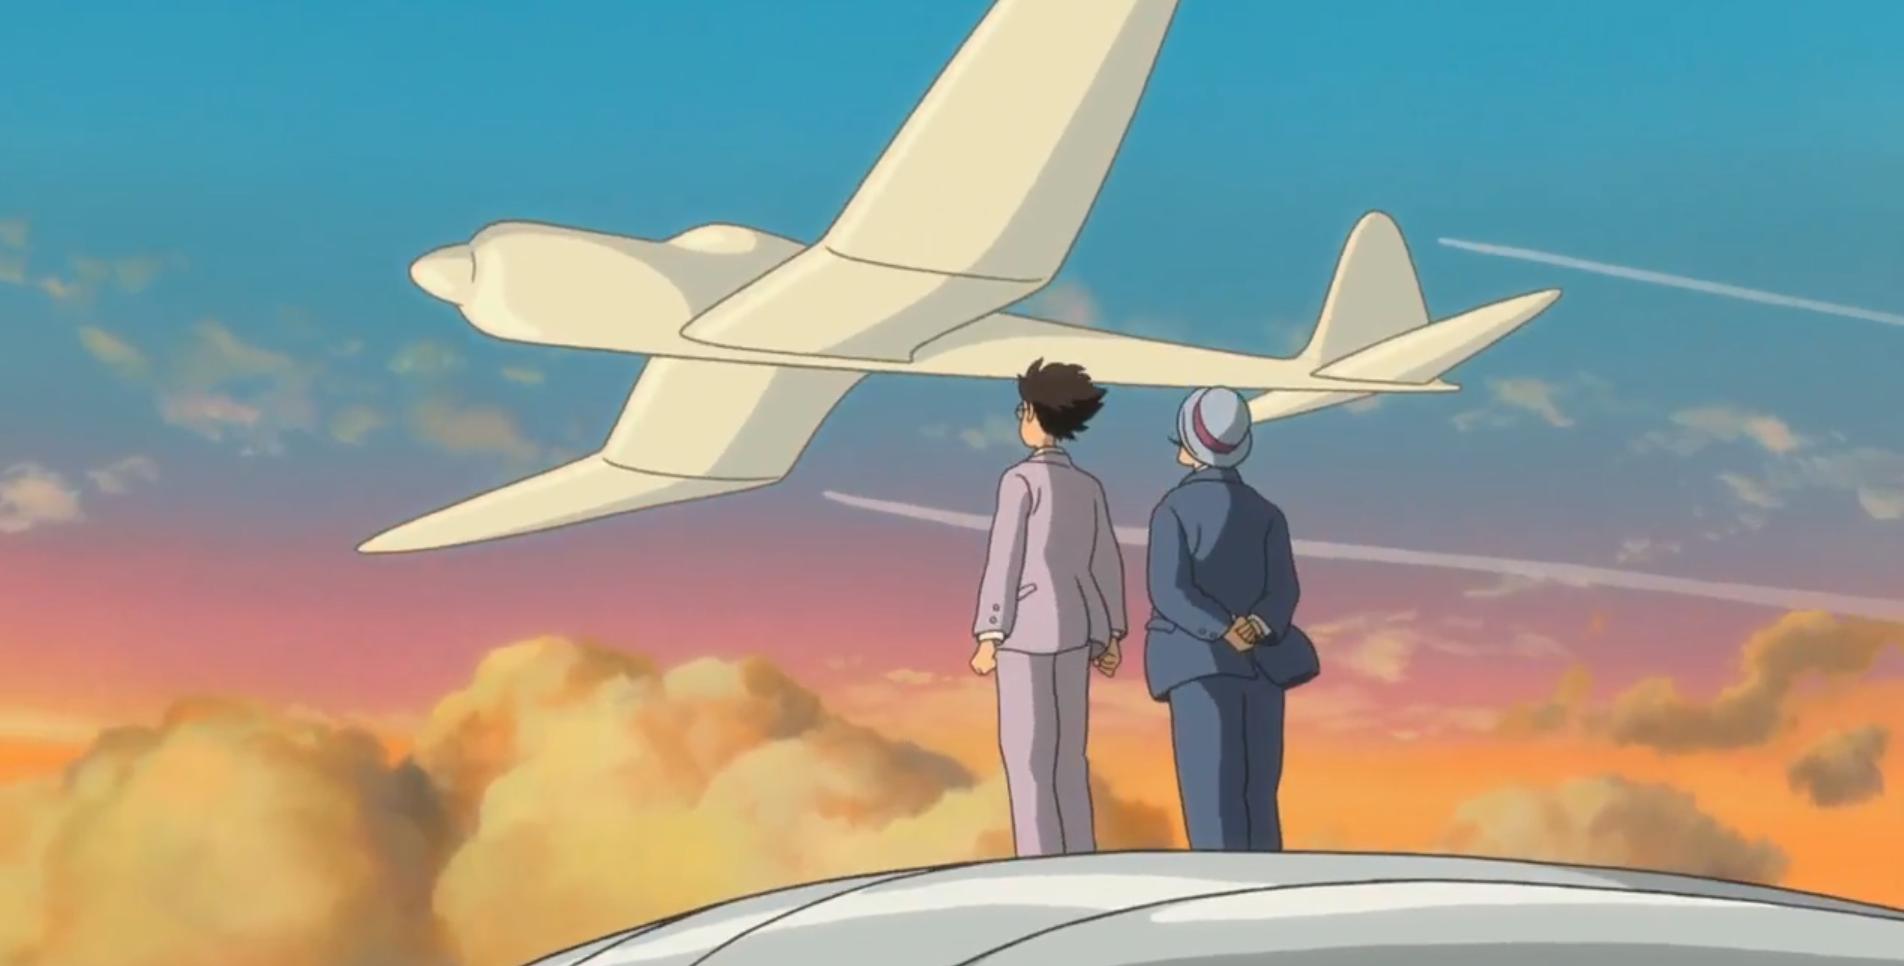 21 Most Depressed Anime Characters: Jiro Horikoshi (The Wind Rises)